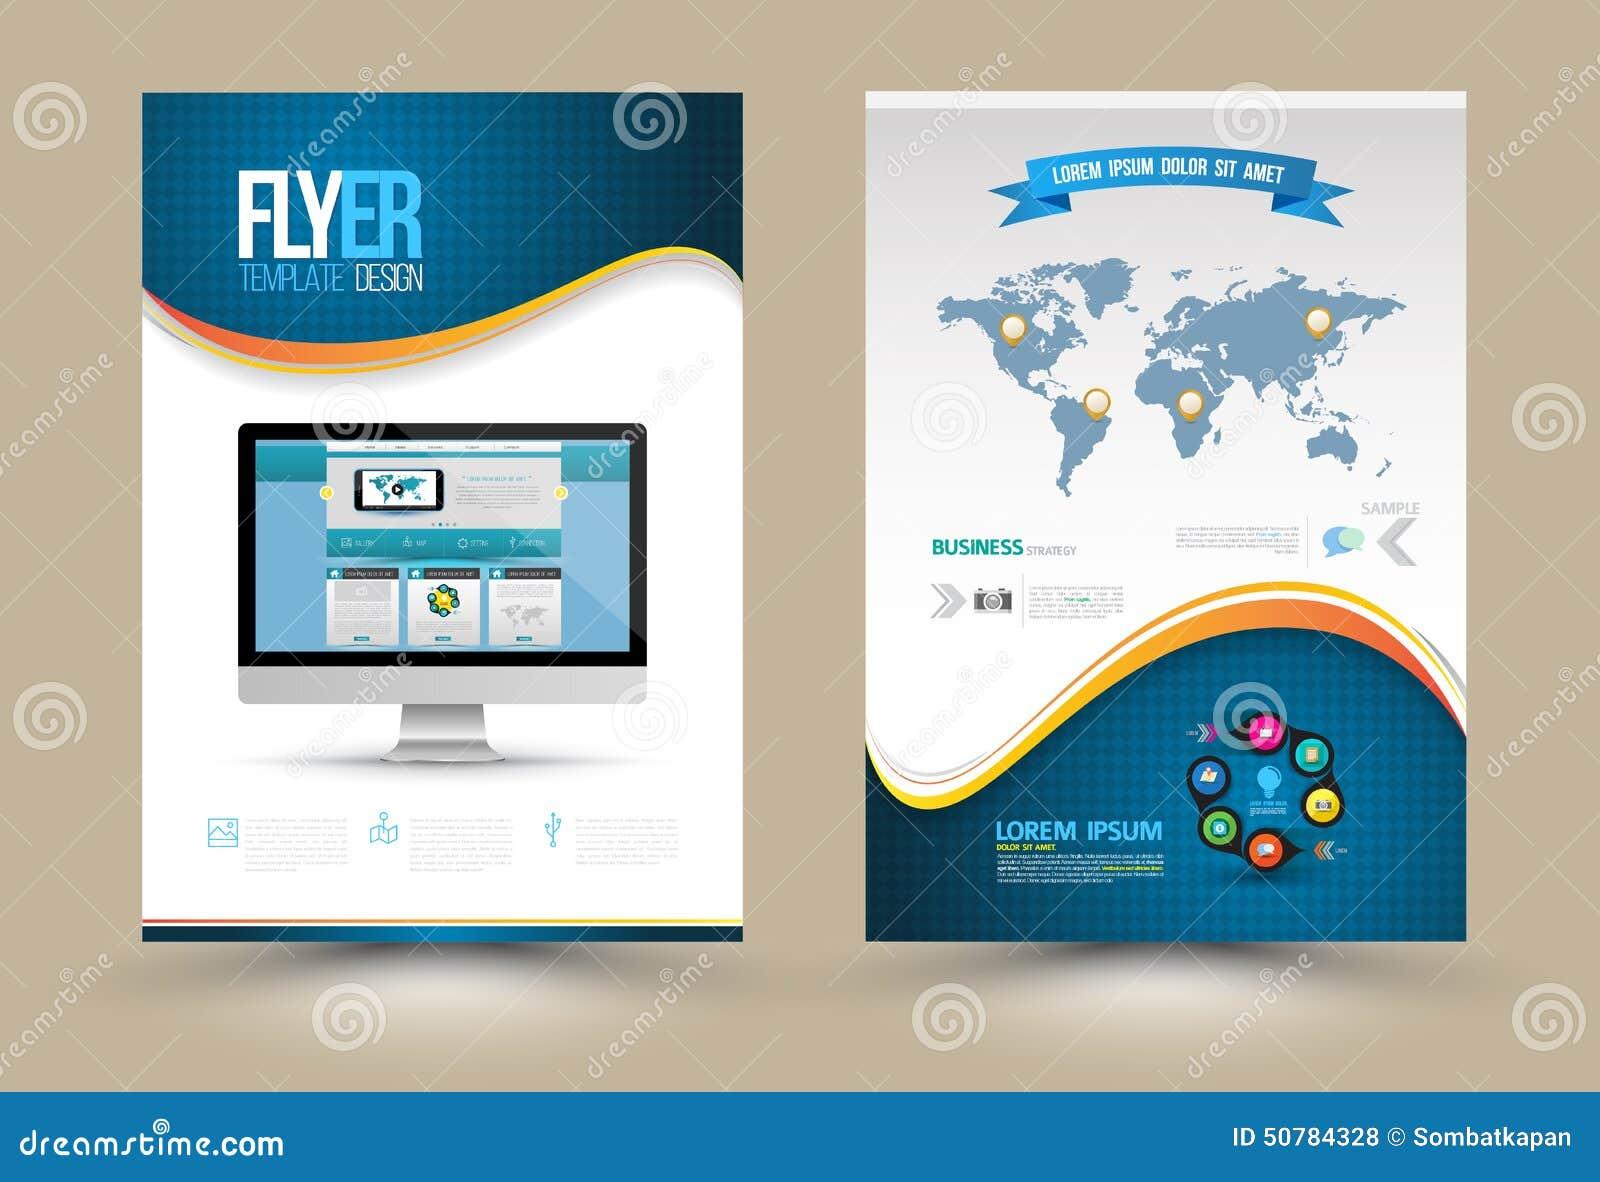 flyers templates online